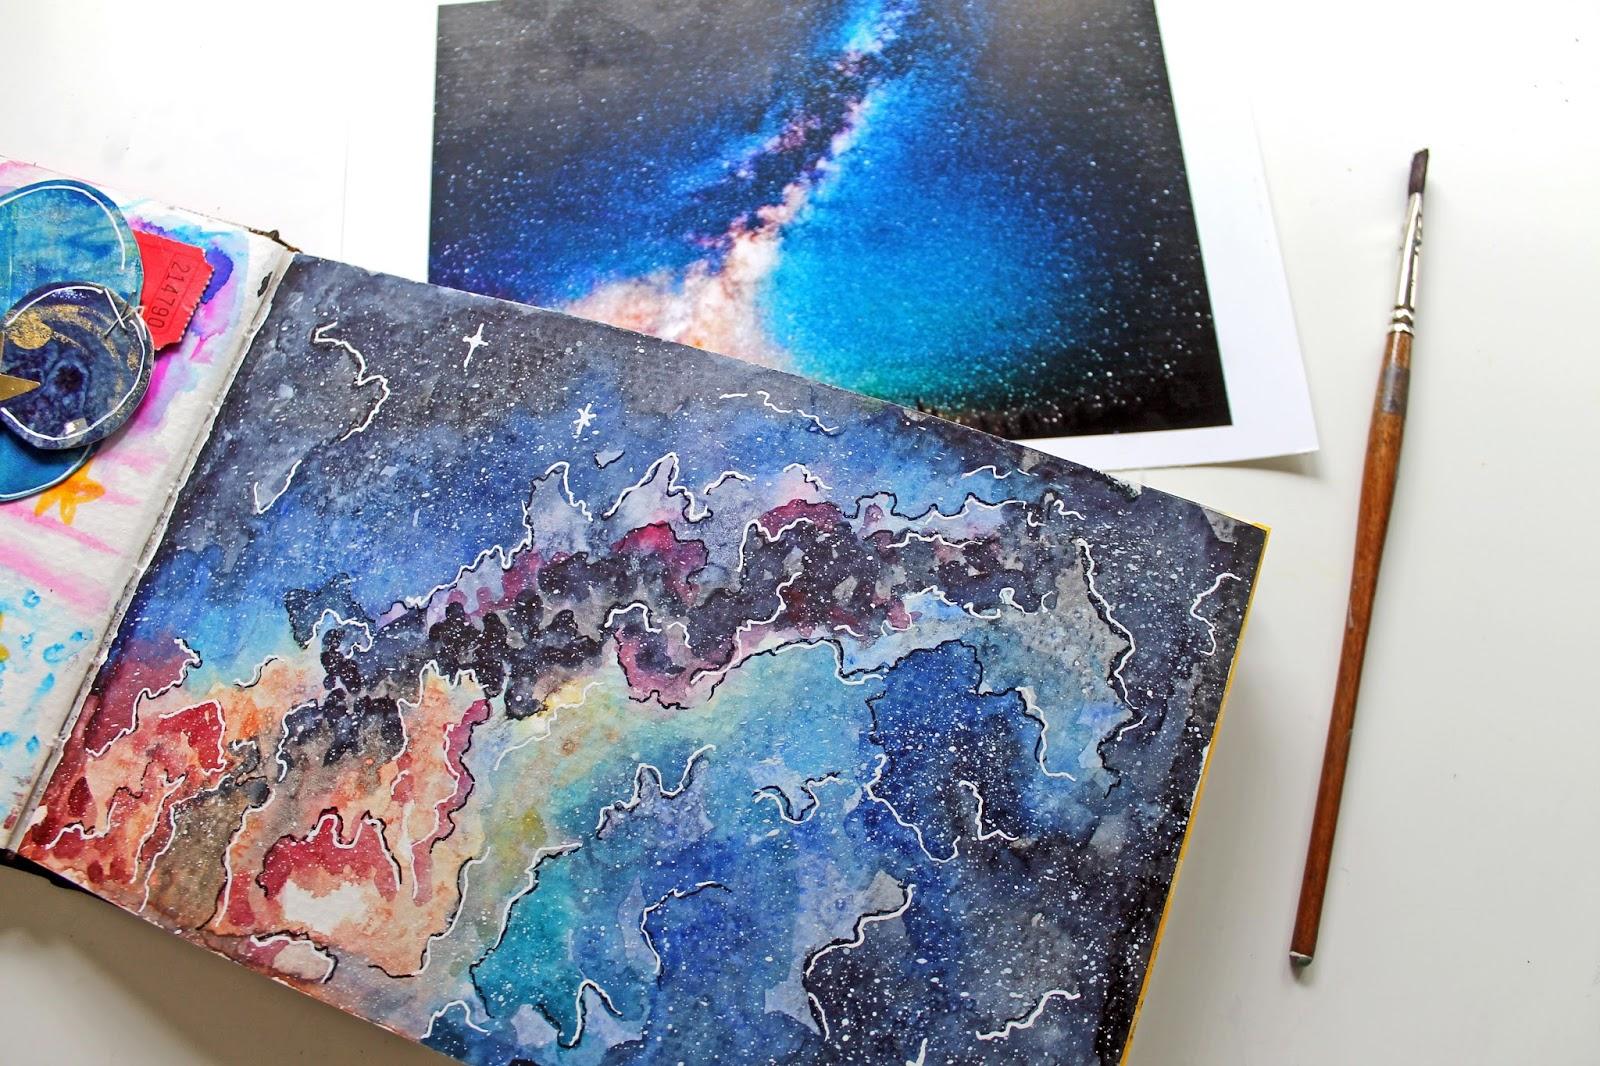 https://1.bp.blogspot.com/-docp5NkKkZs/Wa1ZyH4oY_I/AAAAAAAAhpQ/3XdEsgYoEHQ_uSq9EB6Q2zRvGedV1s2GACLcBGAs/s1600/gm-painting%2Bgalaxies-promo-10.jpg